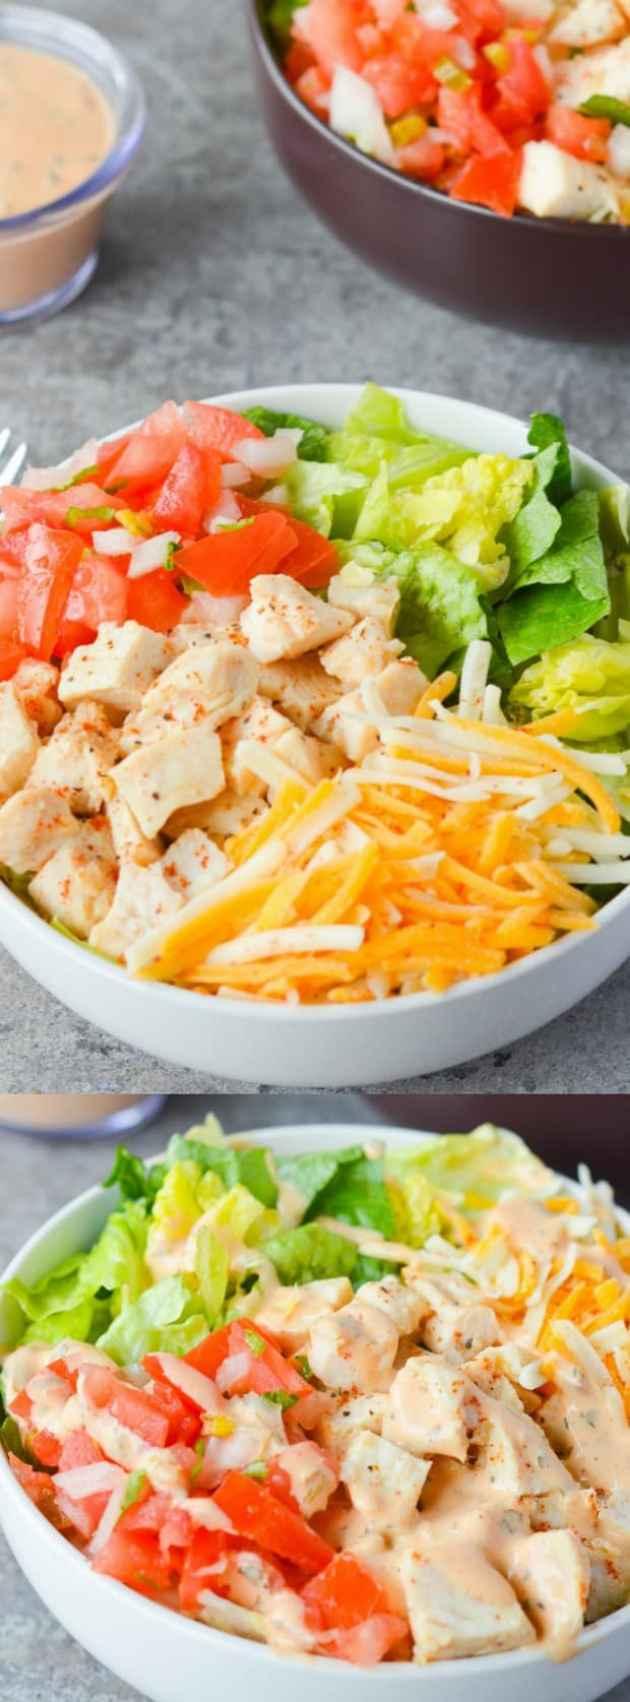 Southwest Chicken Salad Longpin